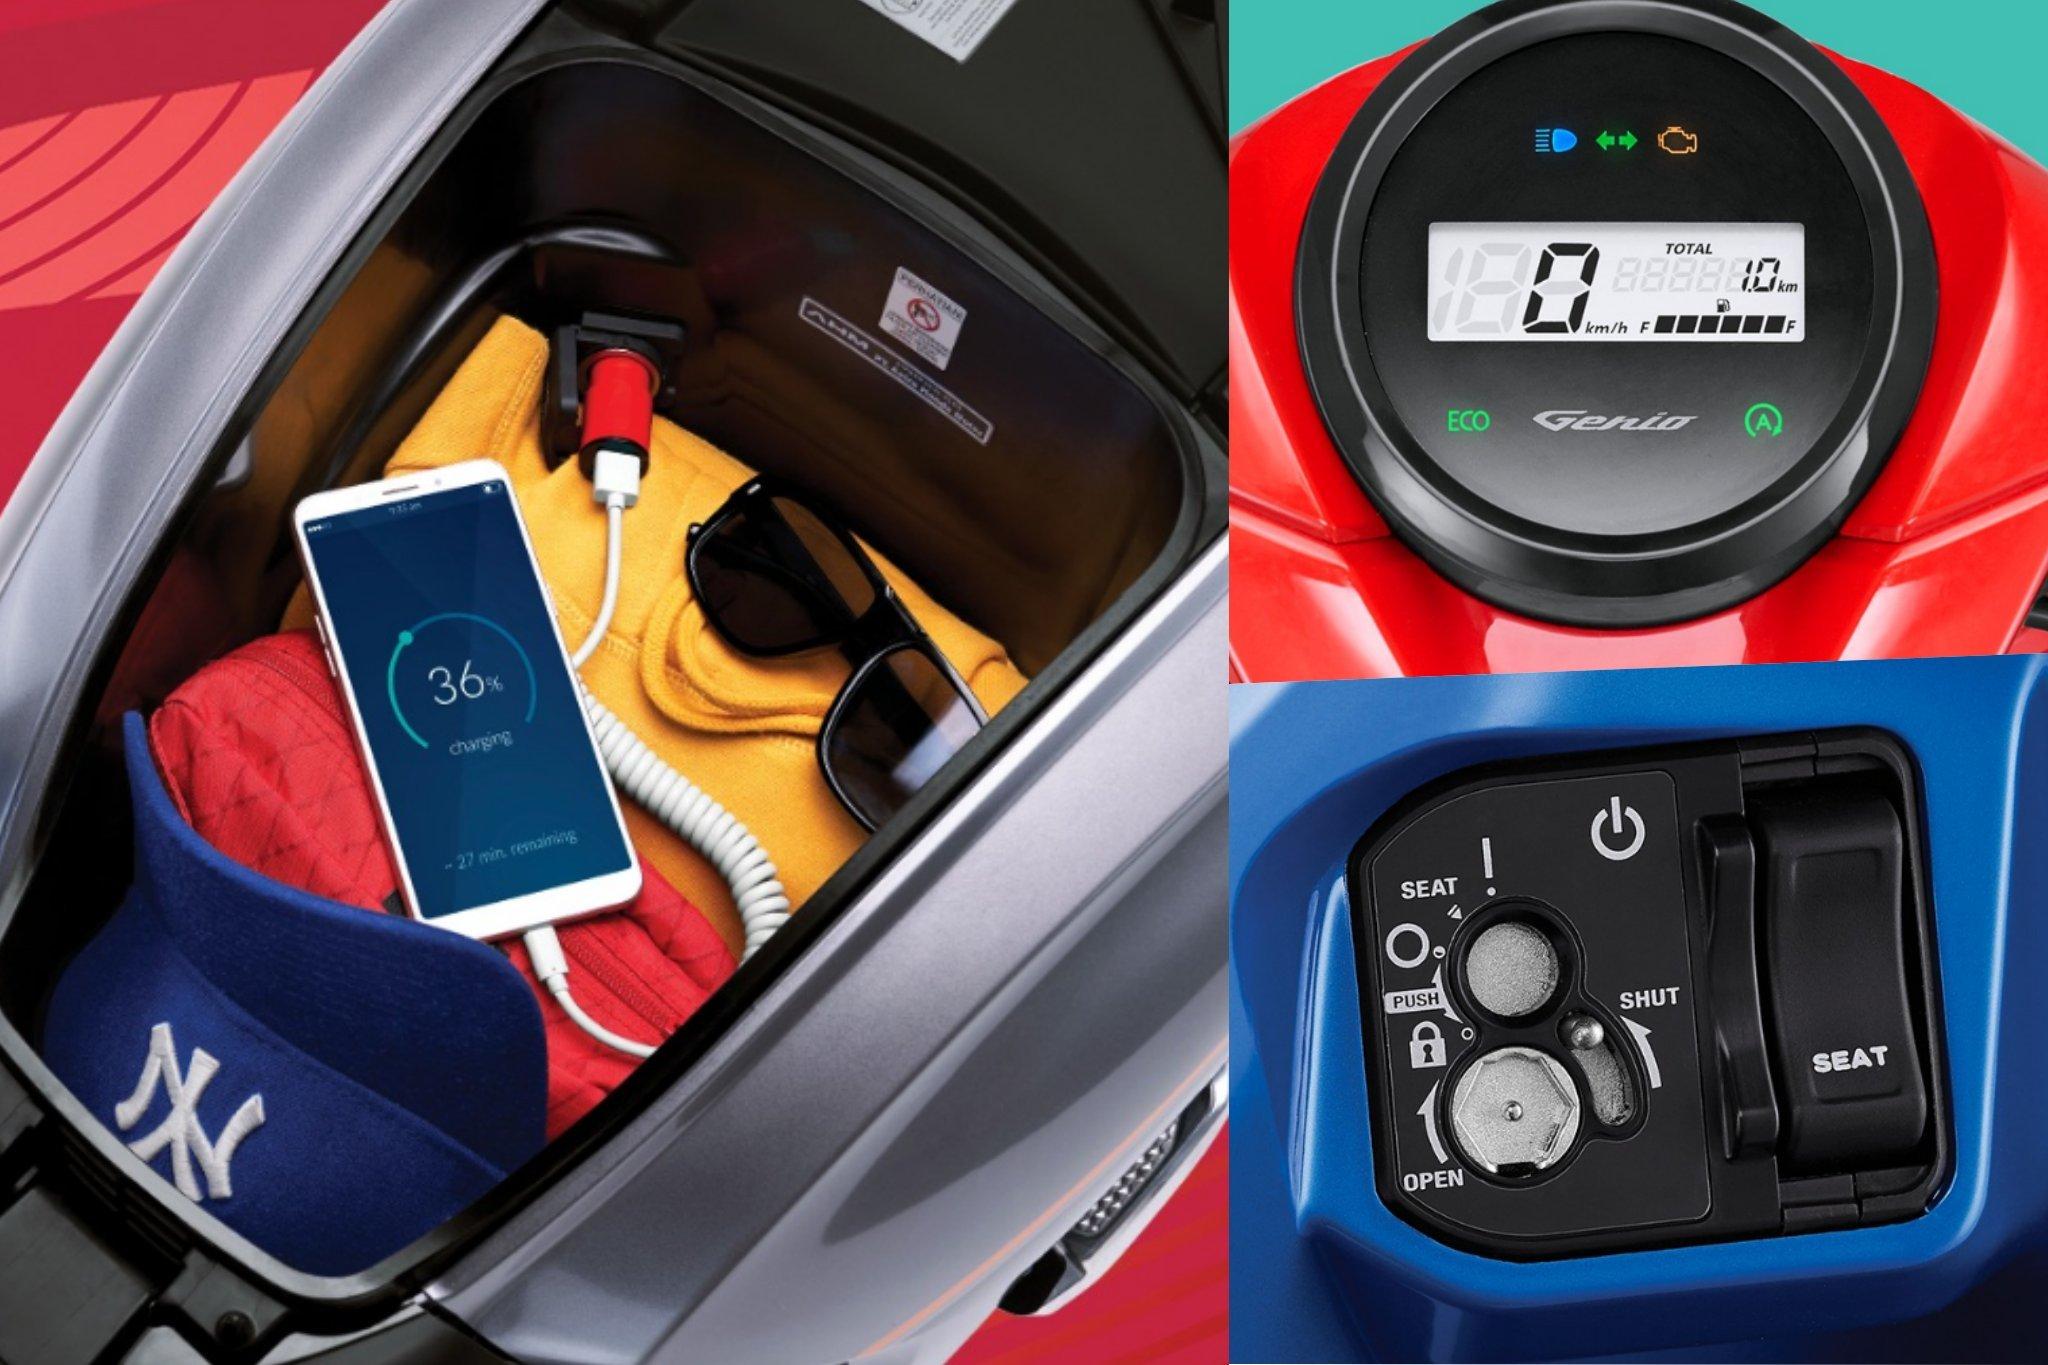 Đánh giá Honda Genio 2020 2021